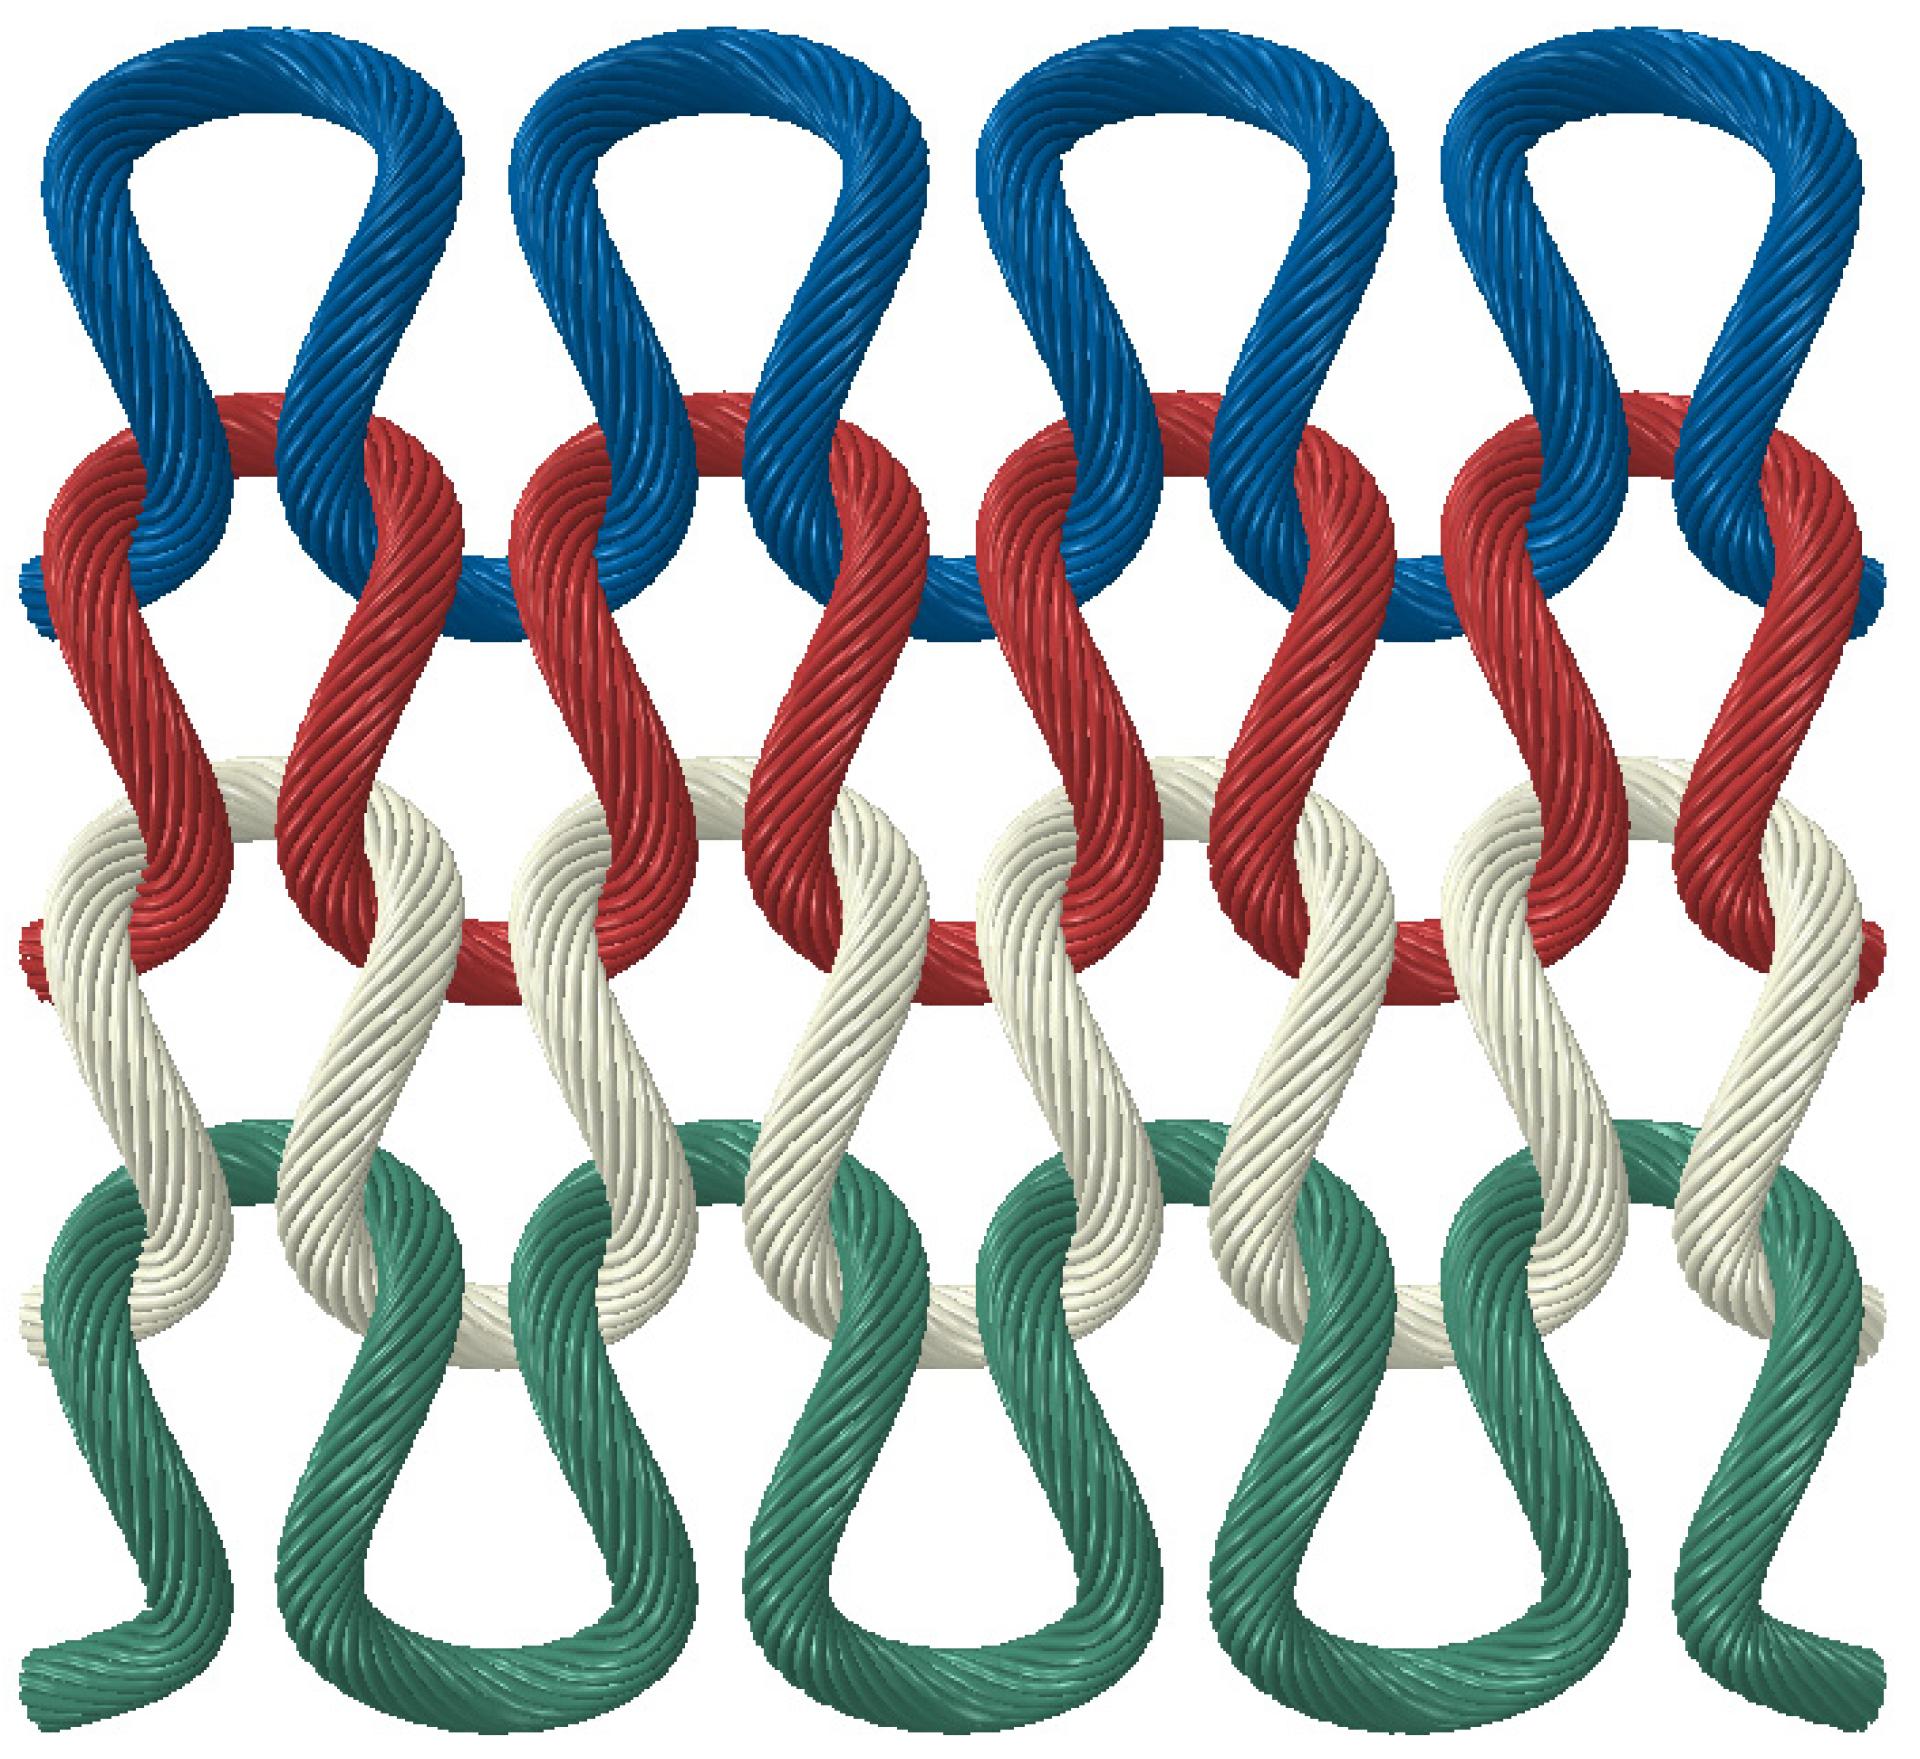 Circular Knitting Fabric : Fibers free full text porosity prediction of plain